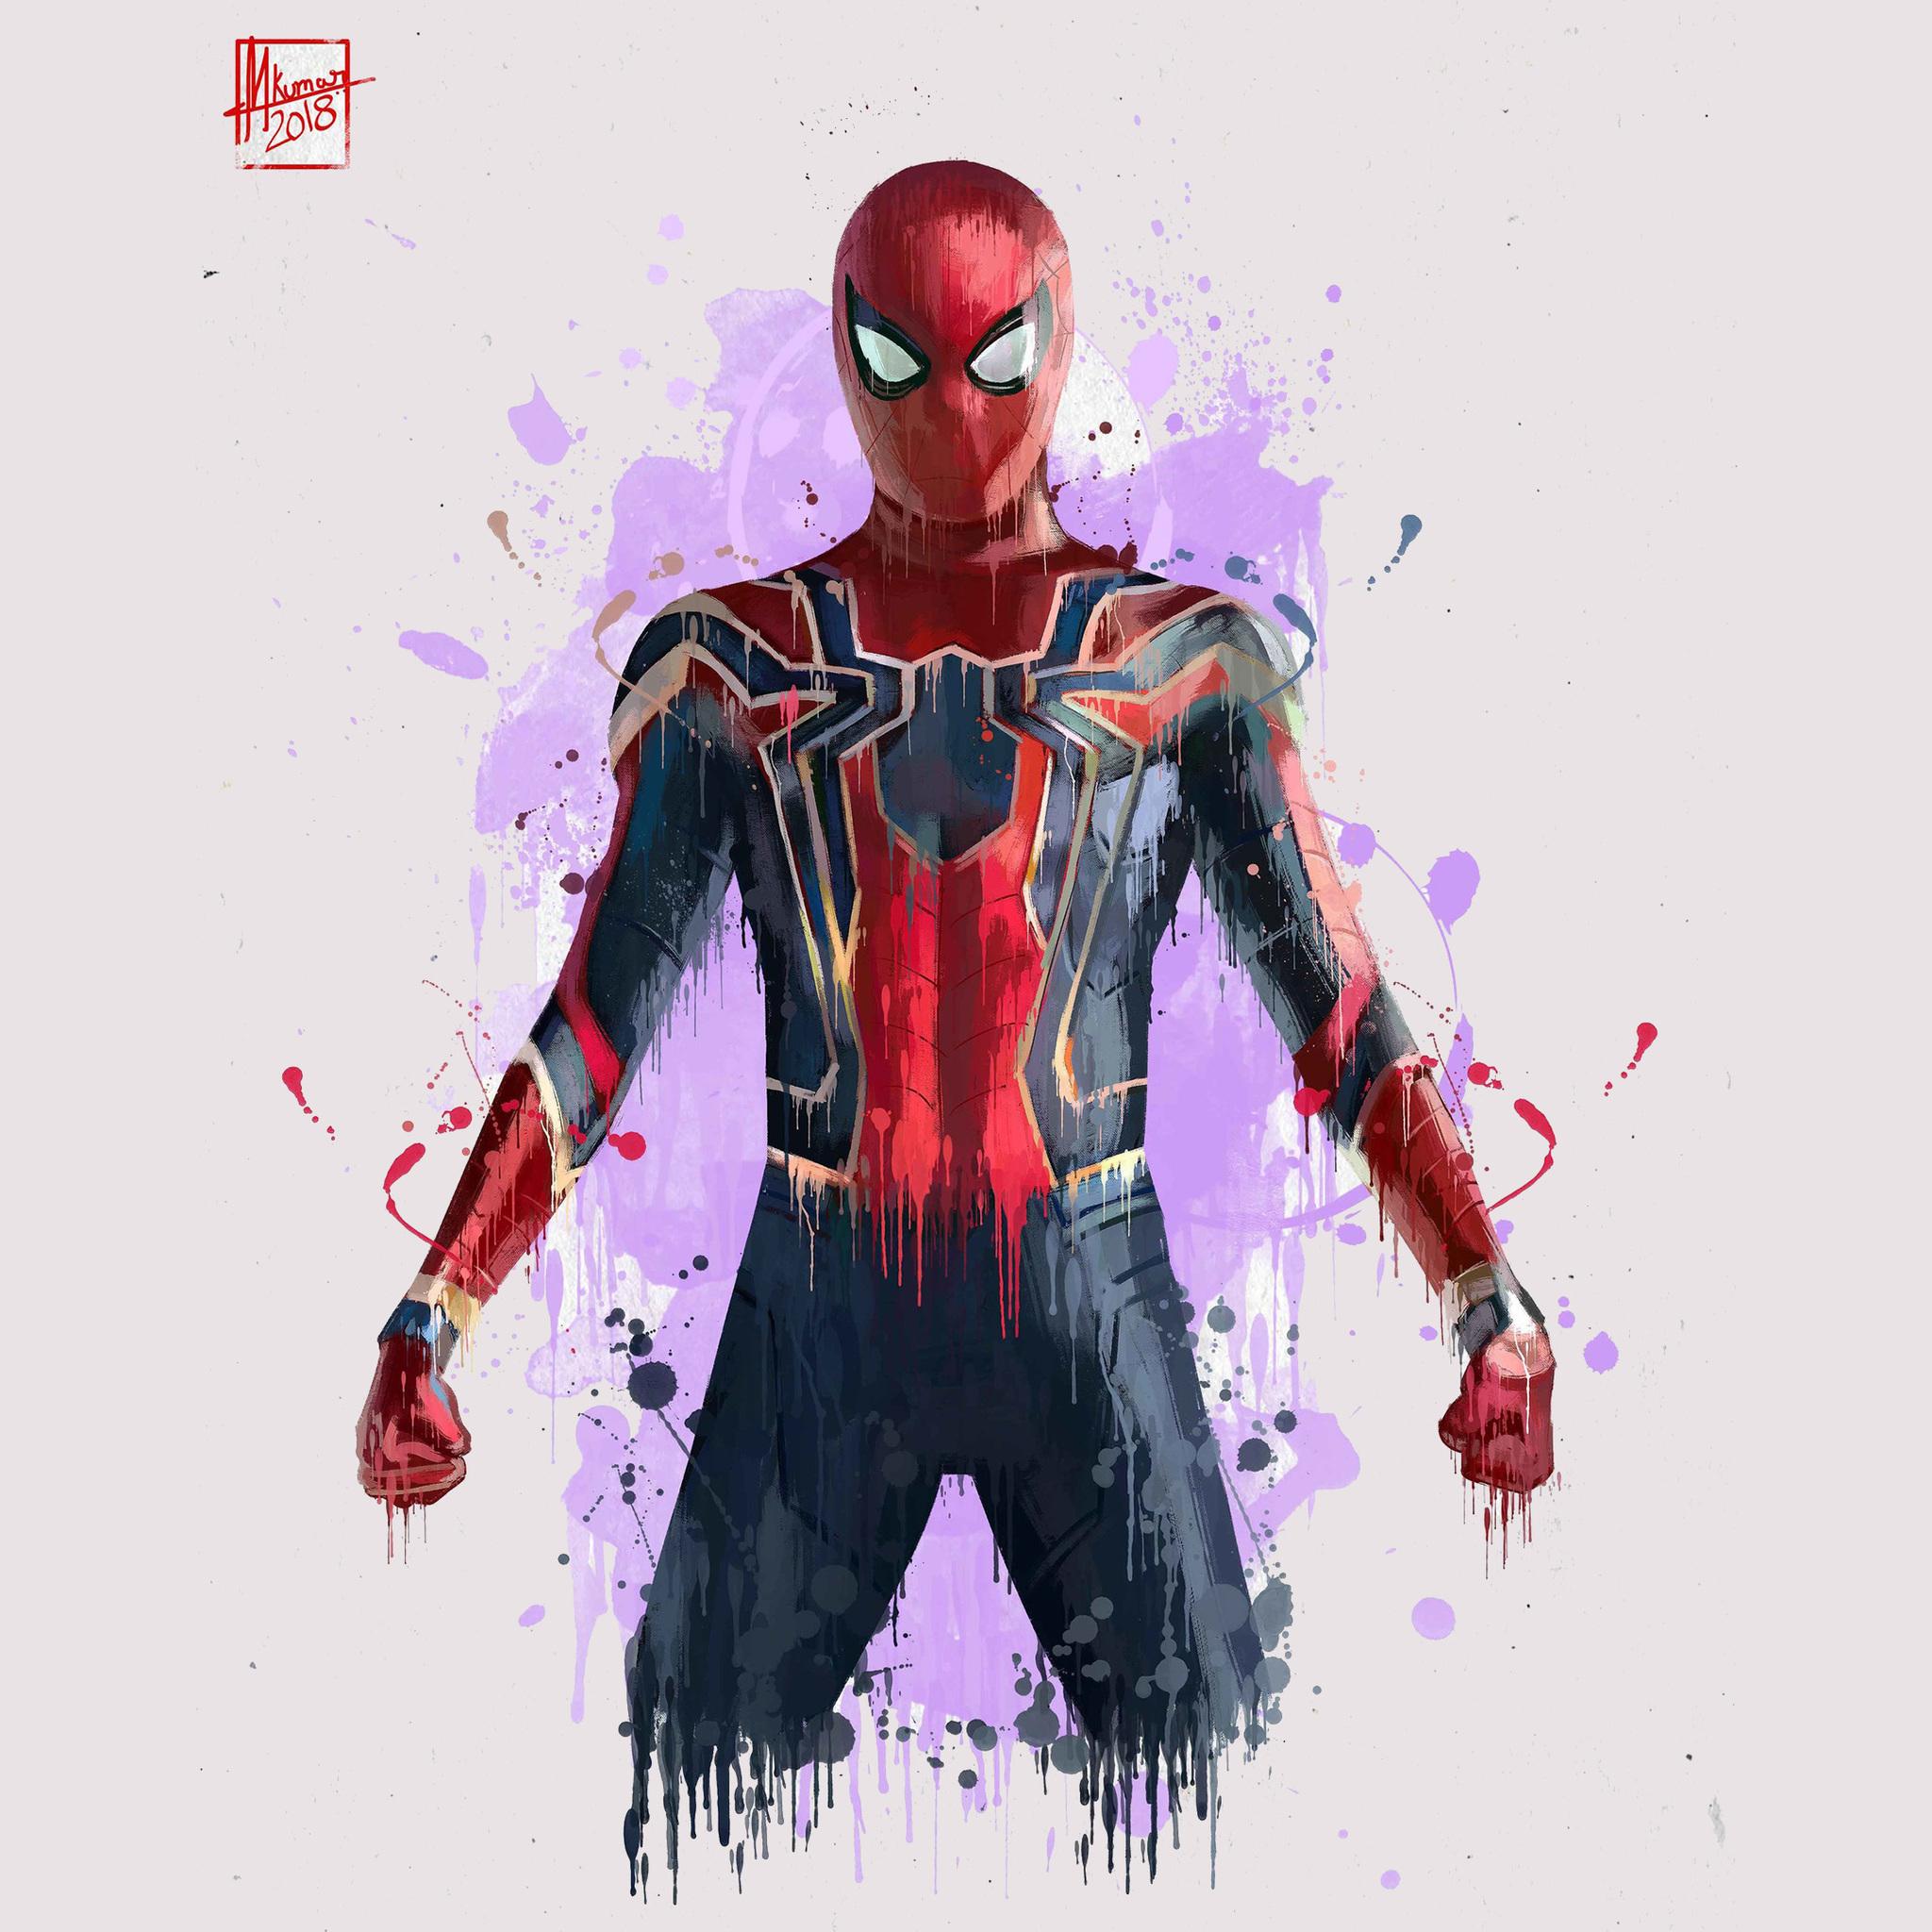 2048x2048 Spiderman In Avengers Infinity War 2018 Artwork